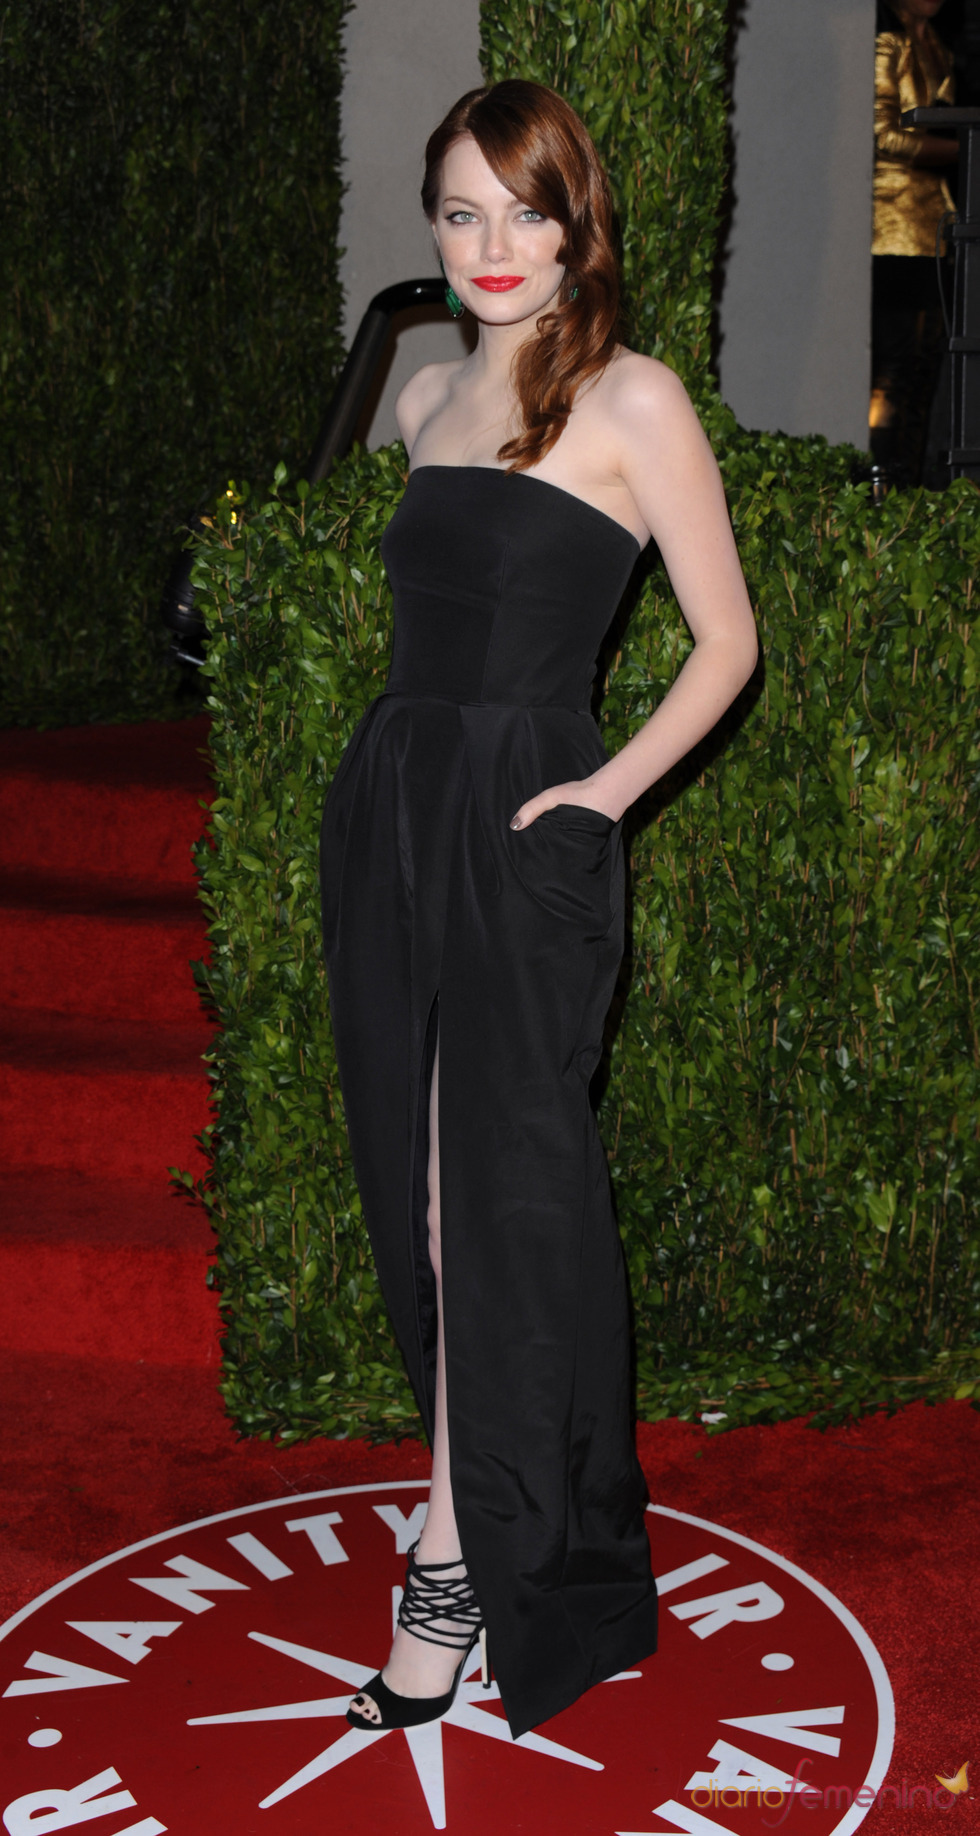 Emma Stone en la fiesta Vanity Fair Oscar 2010